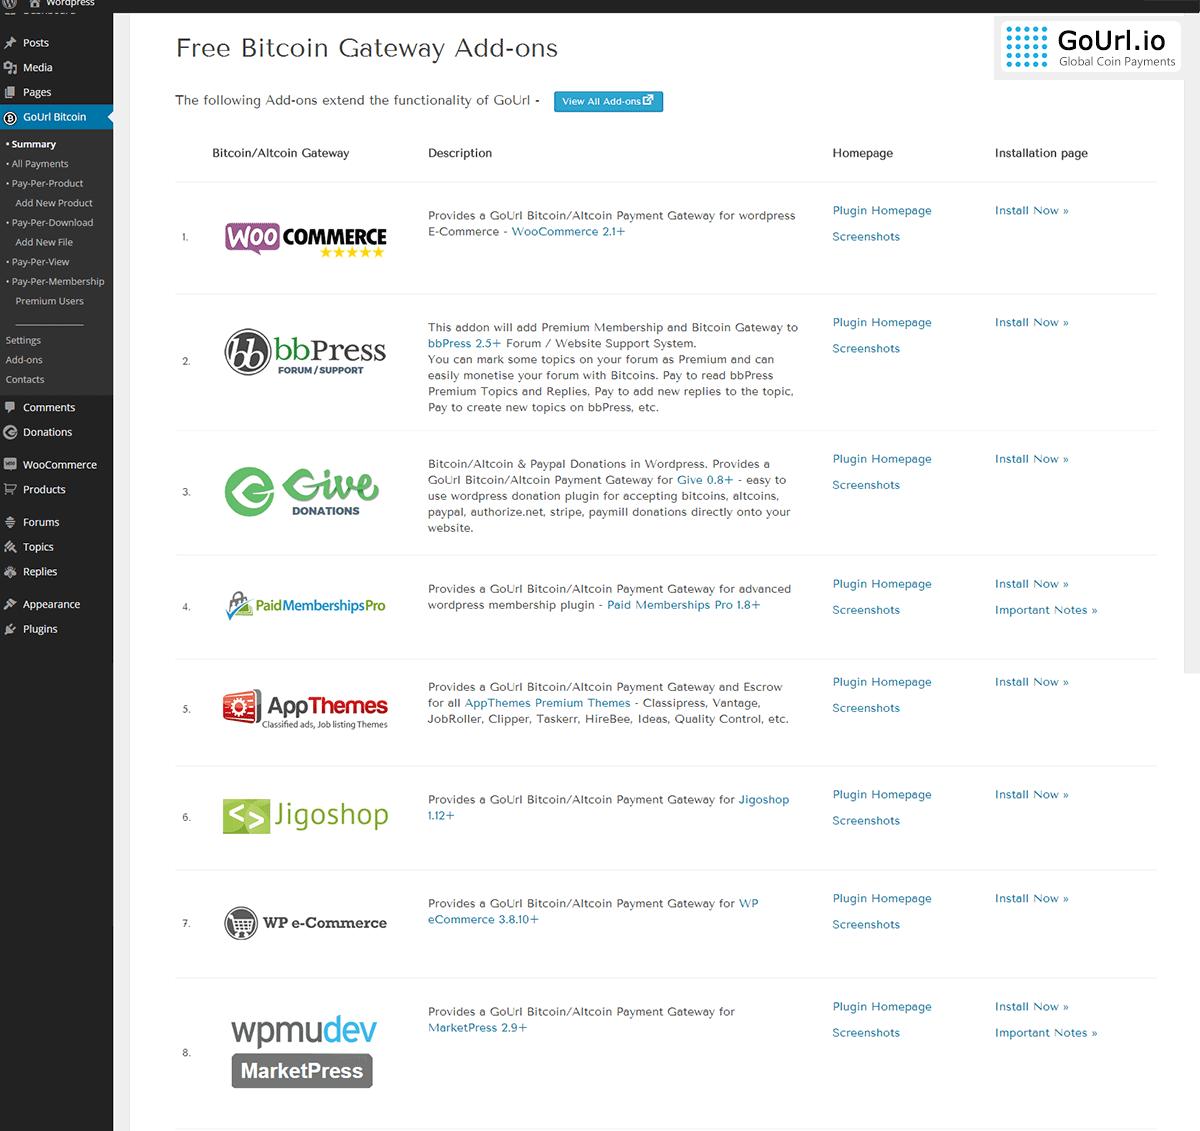 Free Bitcoin Gateway Addons